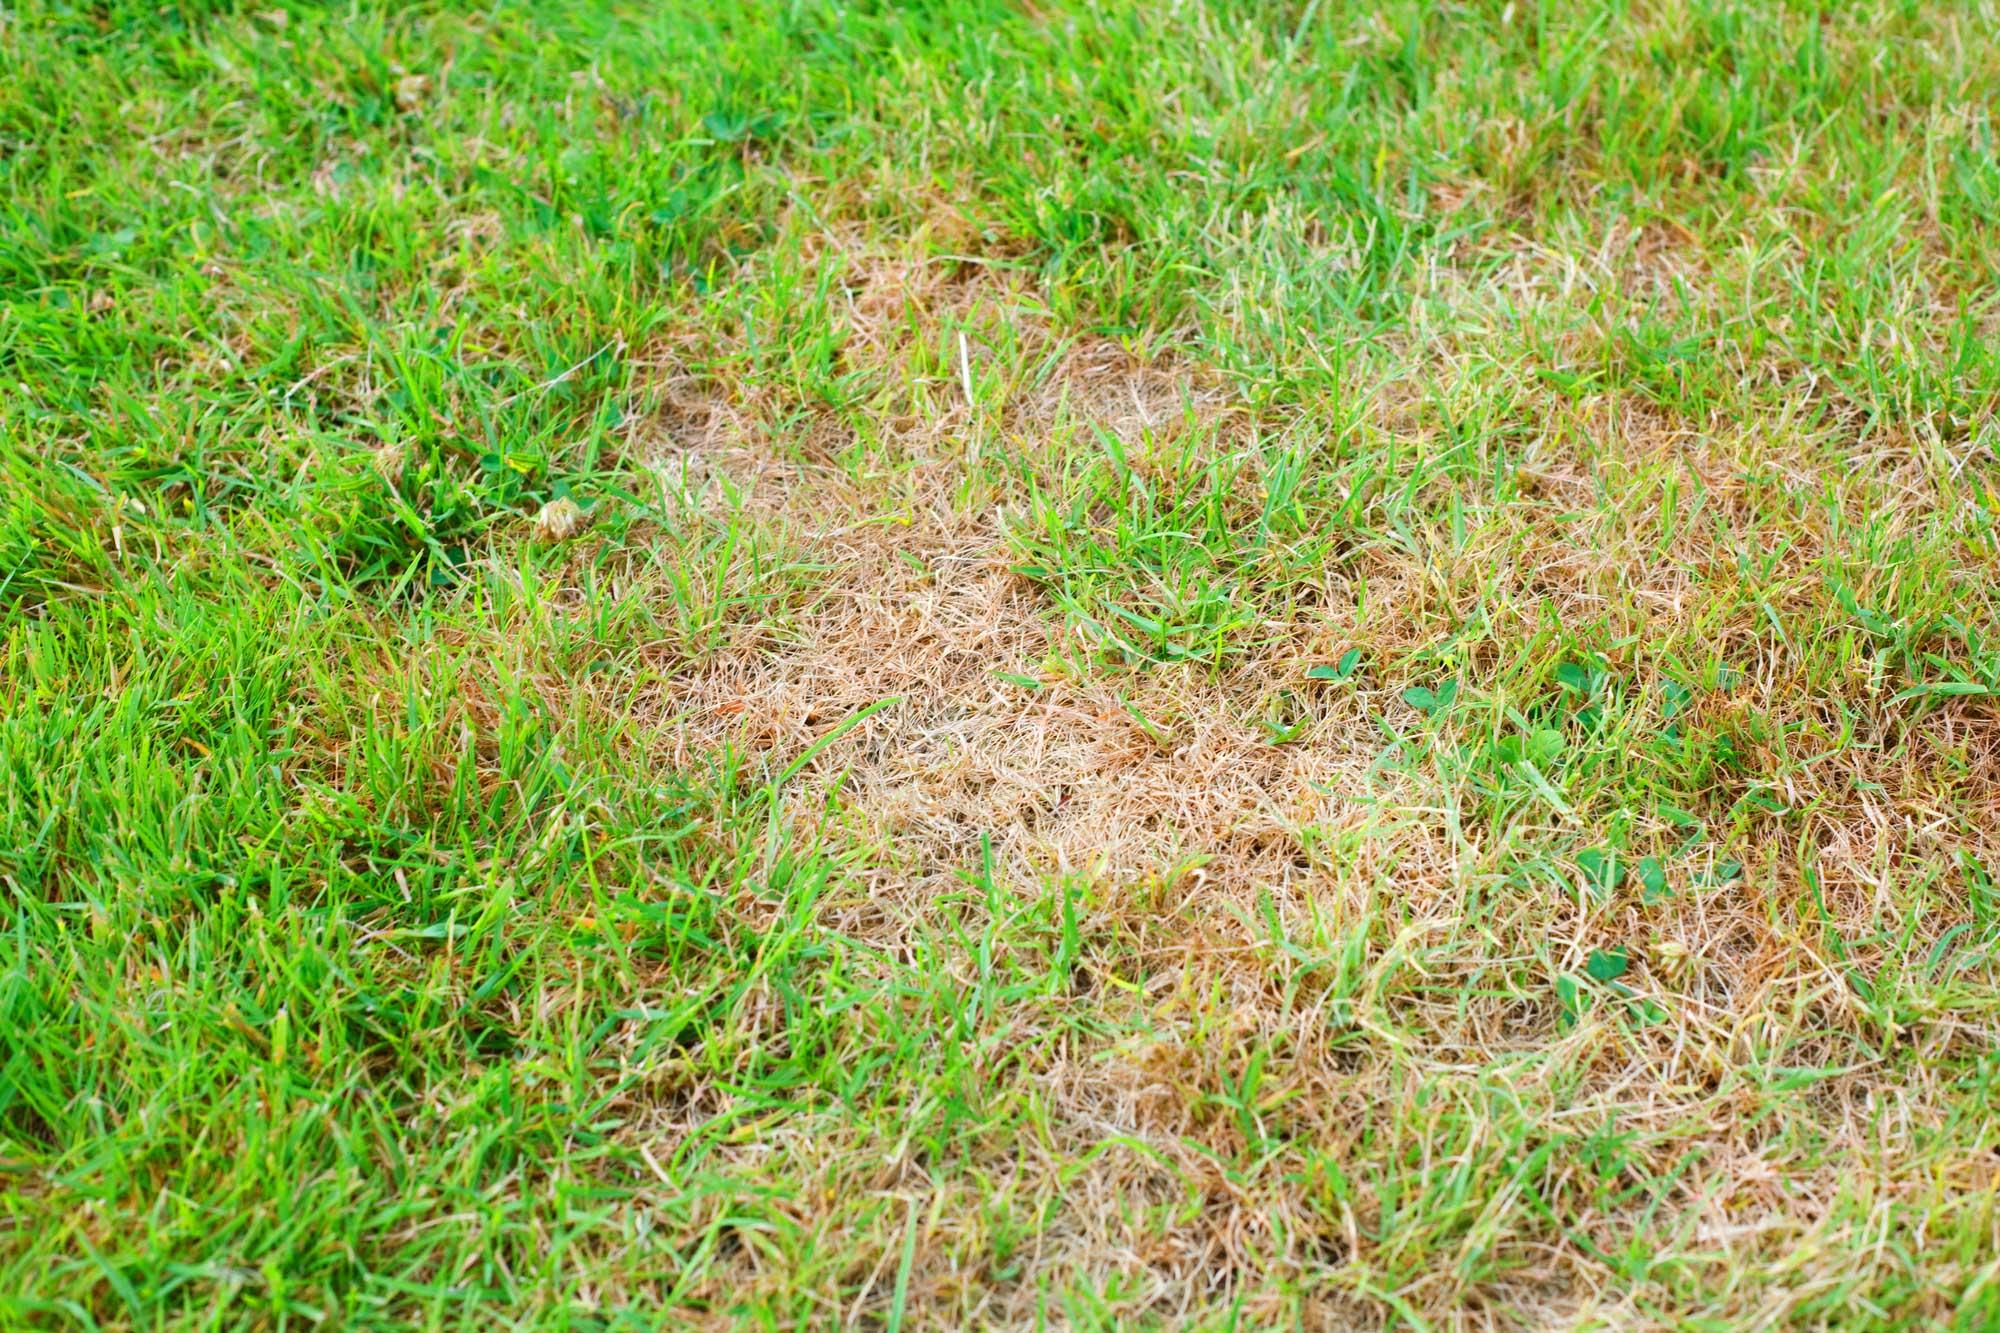 browns-spots-on-grass